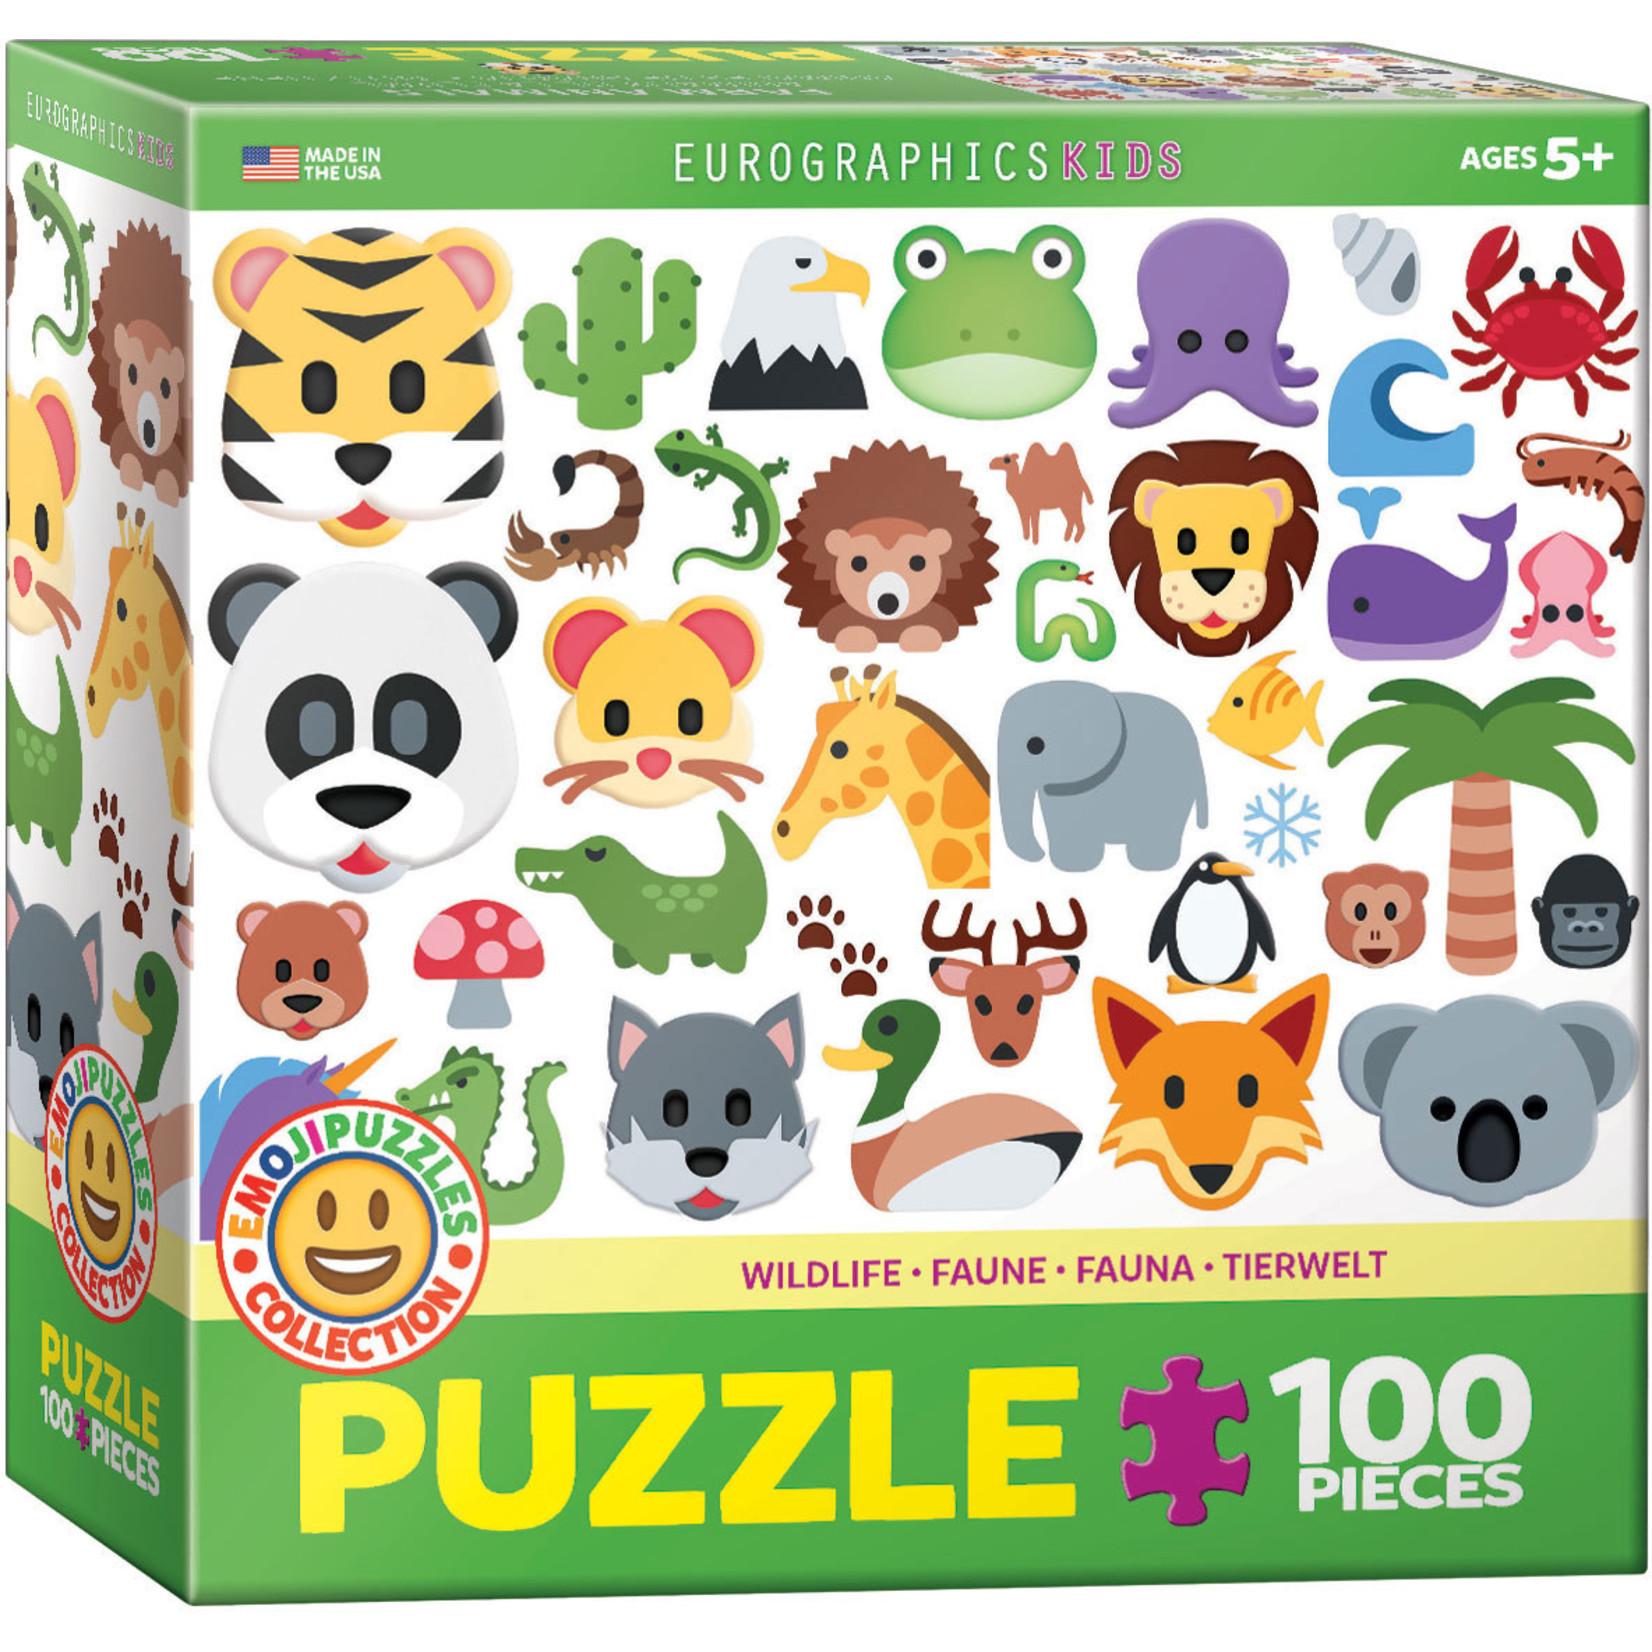 Eurographics Eurographics Puzzle: Emoji Wildlife Animals - 100pc